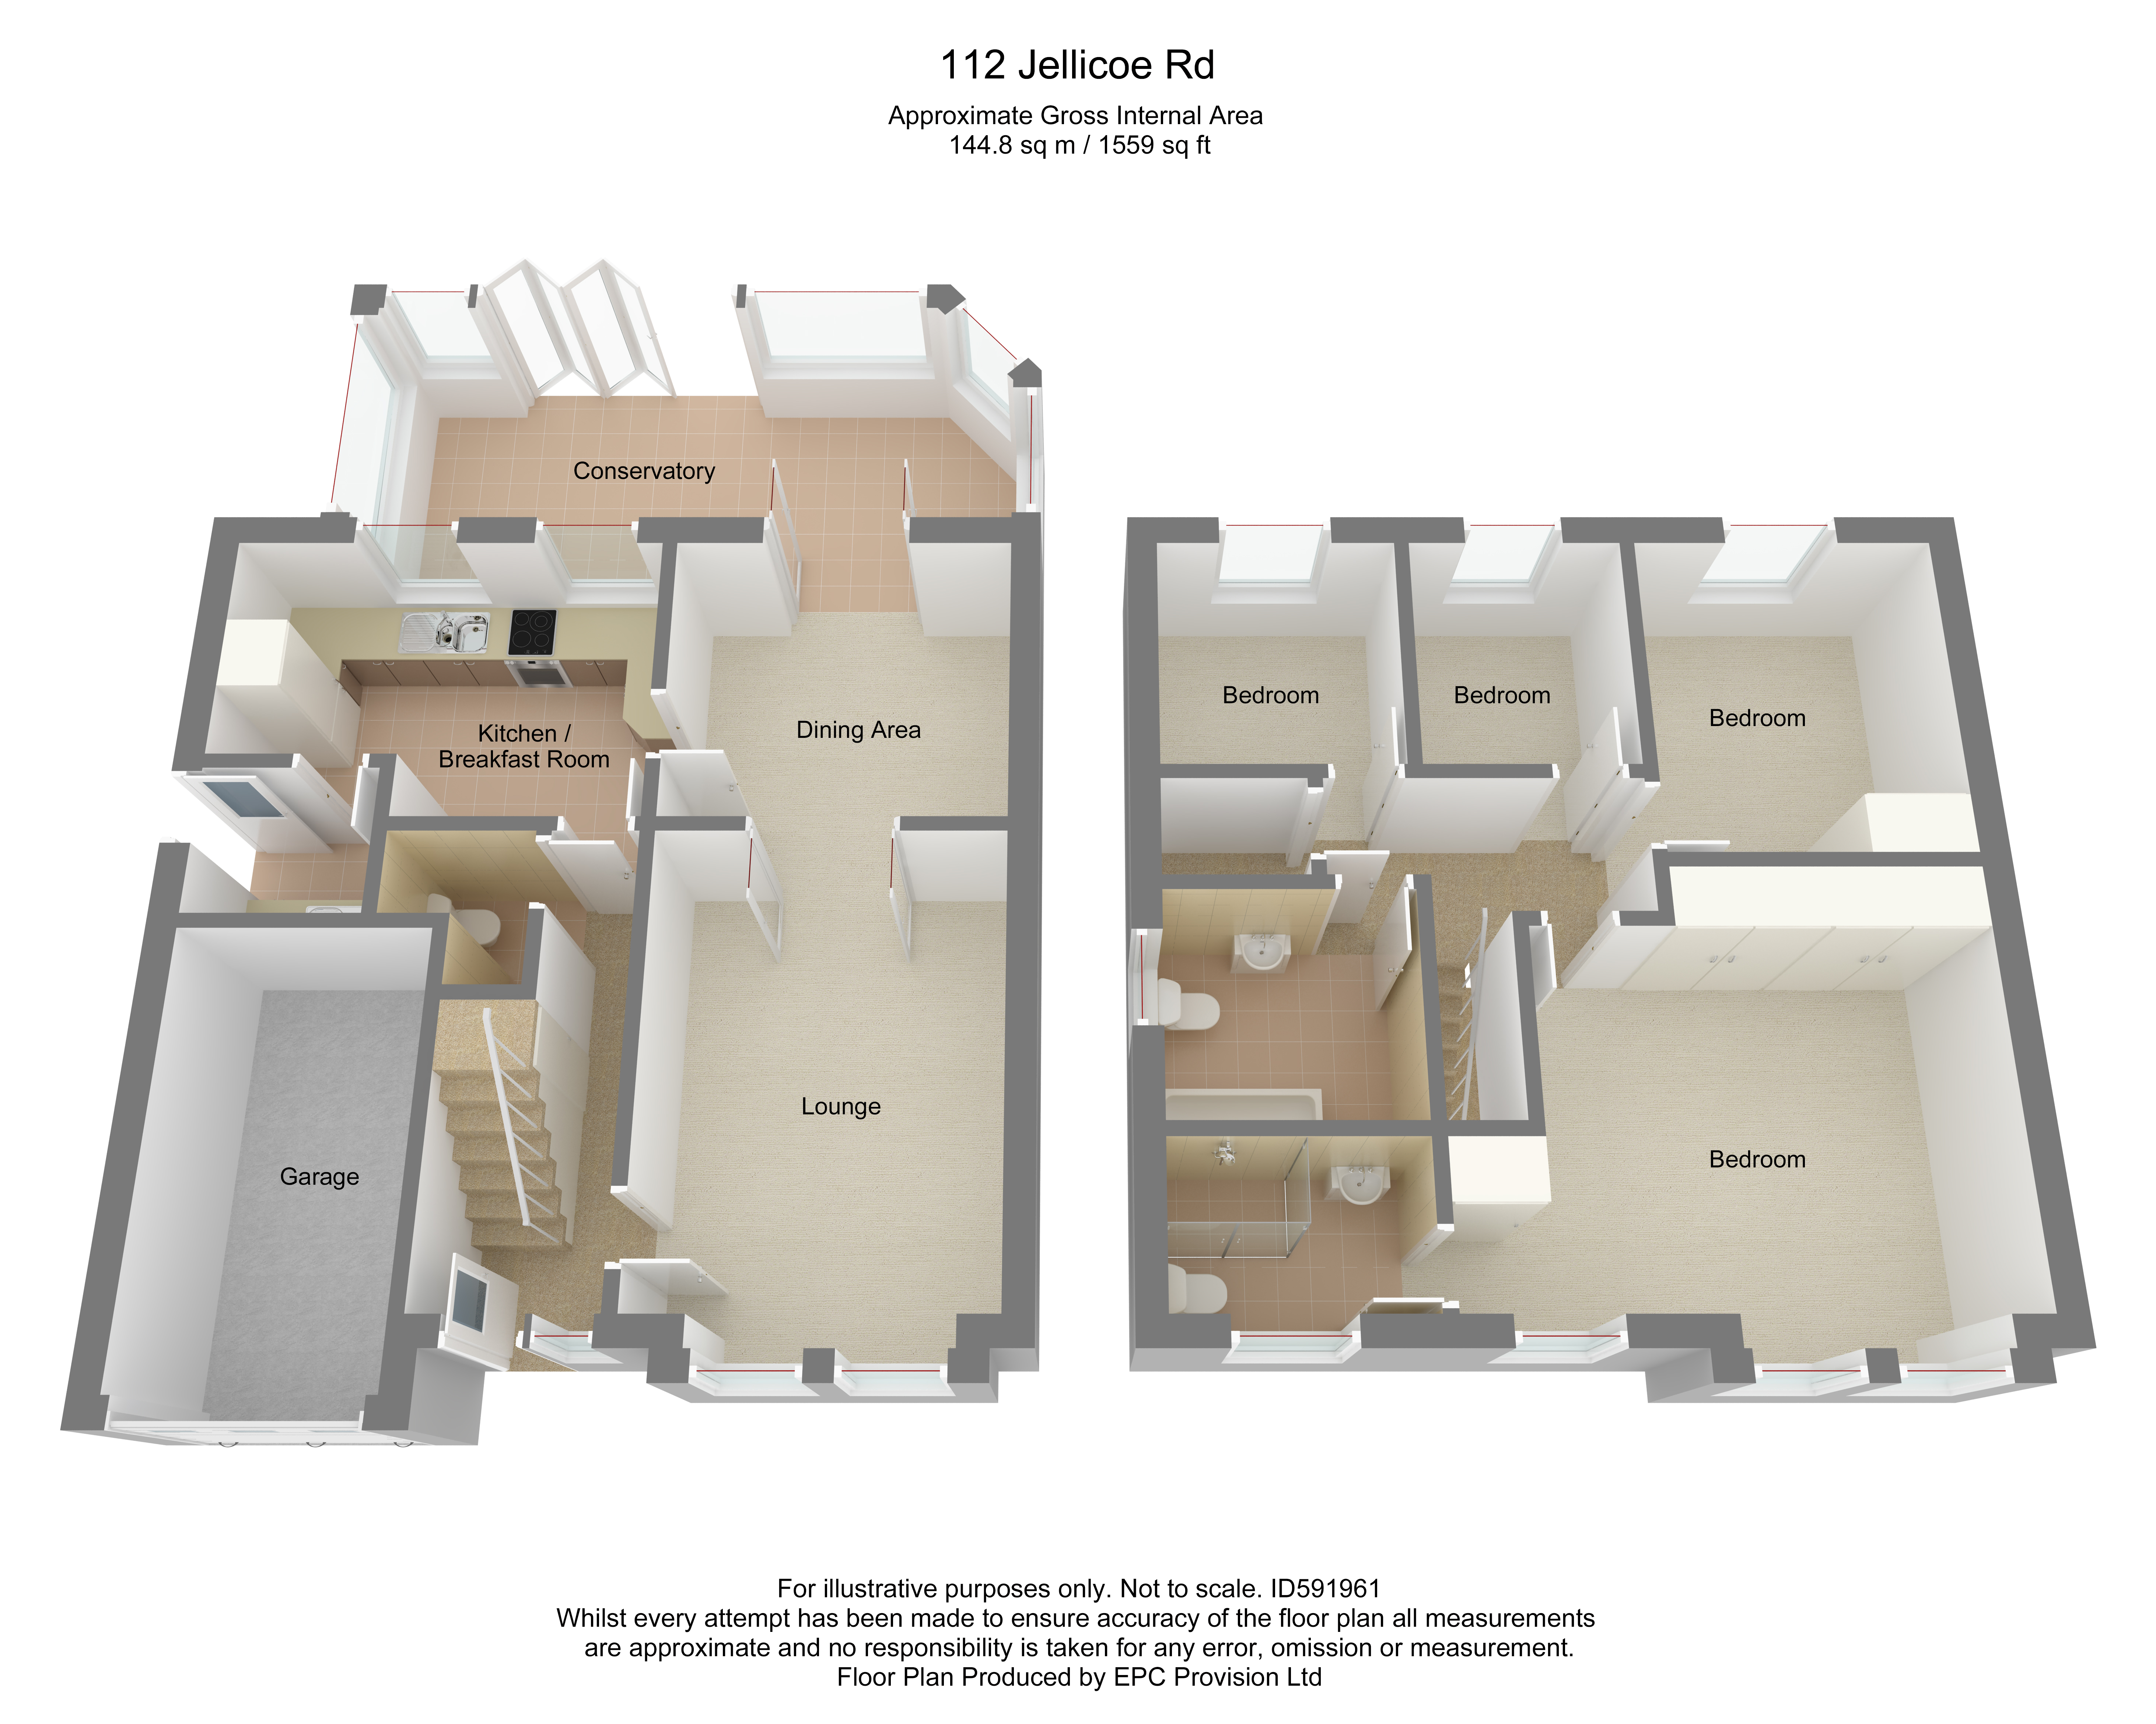 Floorplan for Jellicoe Avenue, Stapleton.